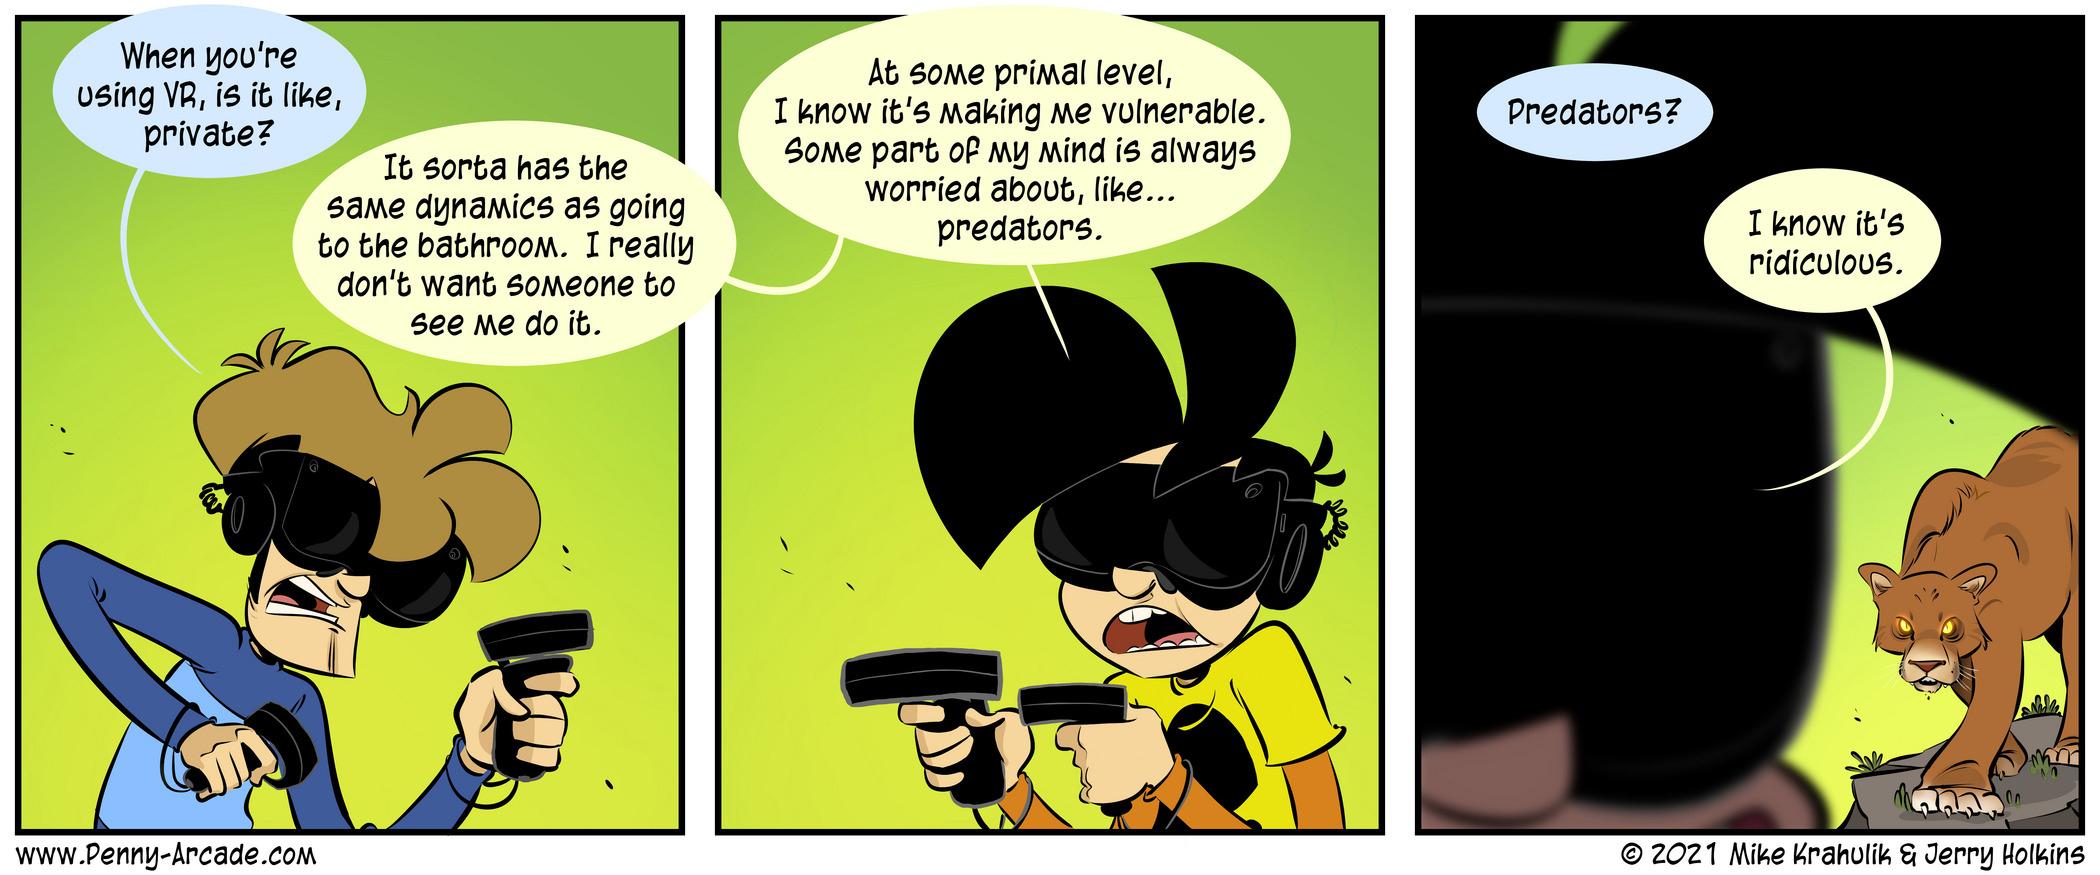 VR-Gefahren-Comics